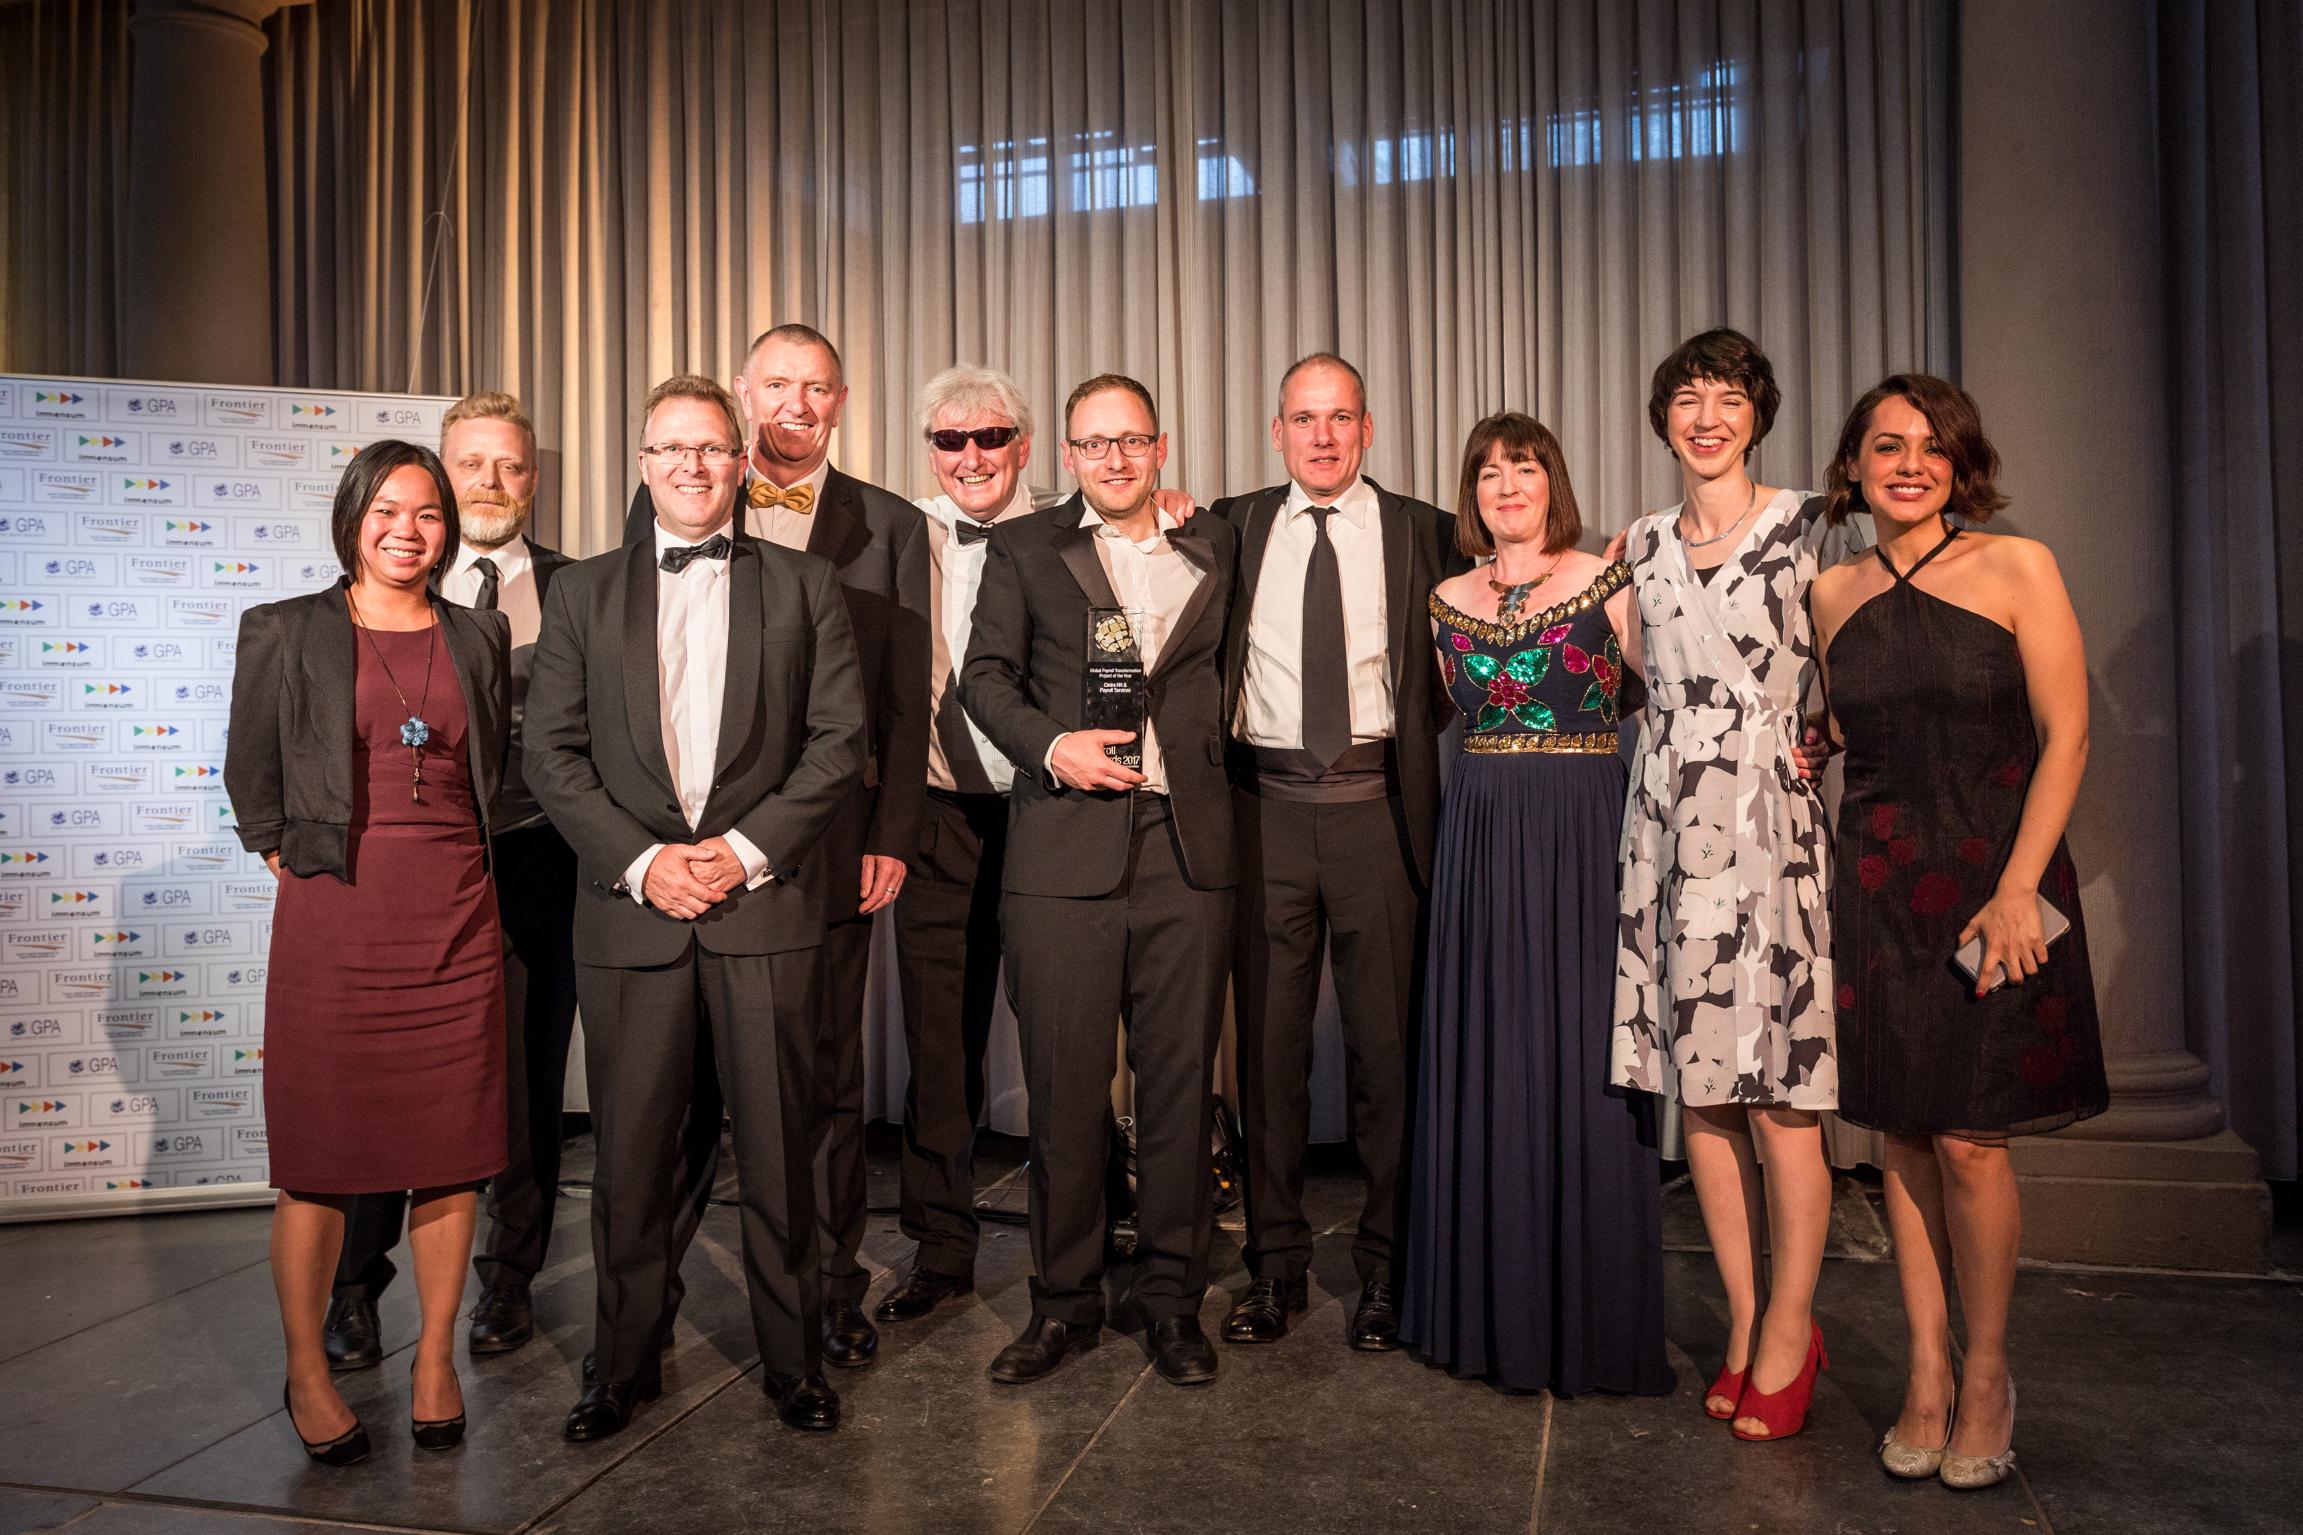 Cintra HR & Payroll Services, Global Payroll Association Award ceremony, Westerkerk Amsterdam